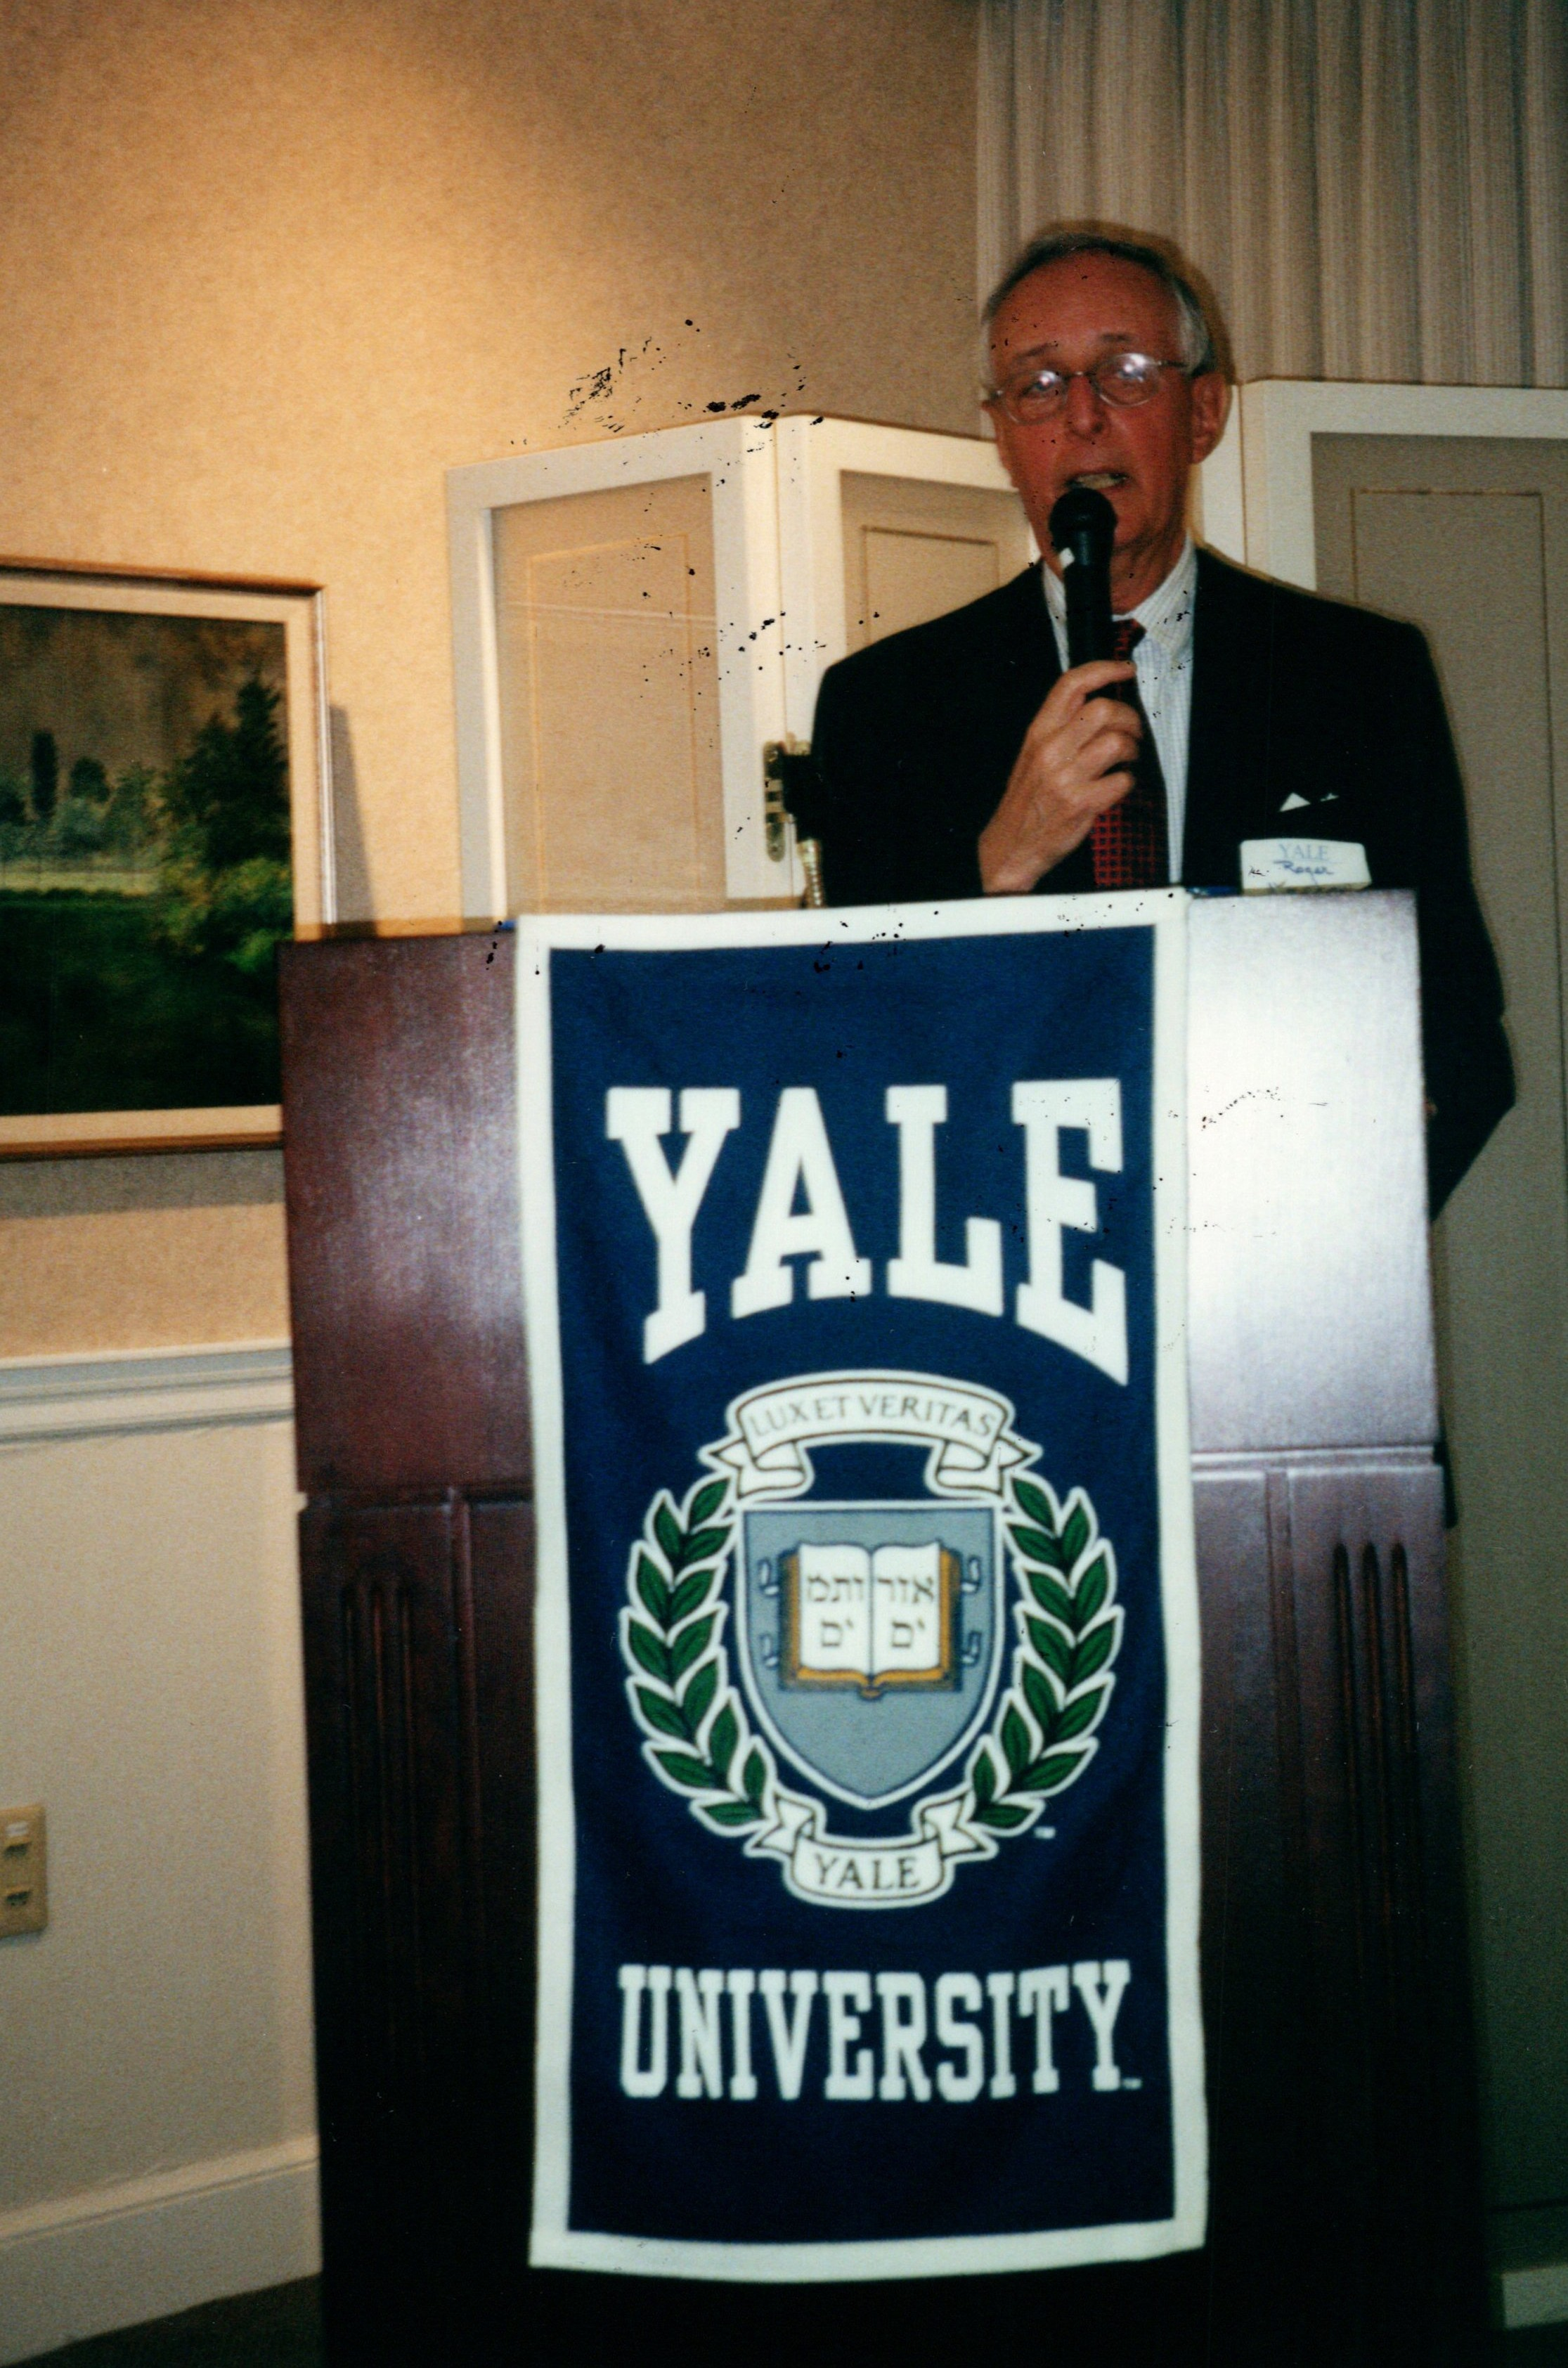 1_15_2001 - 2ND TERCENTENNIAL SPEAKER TRIBUTE PROGRAM HOSTED BY NORTHERN TRUST CO. 12.jpg